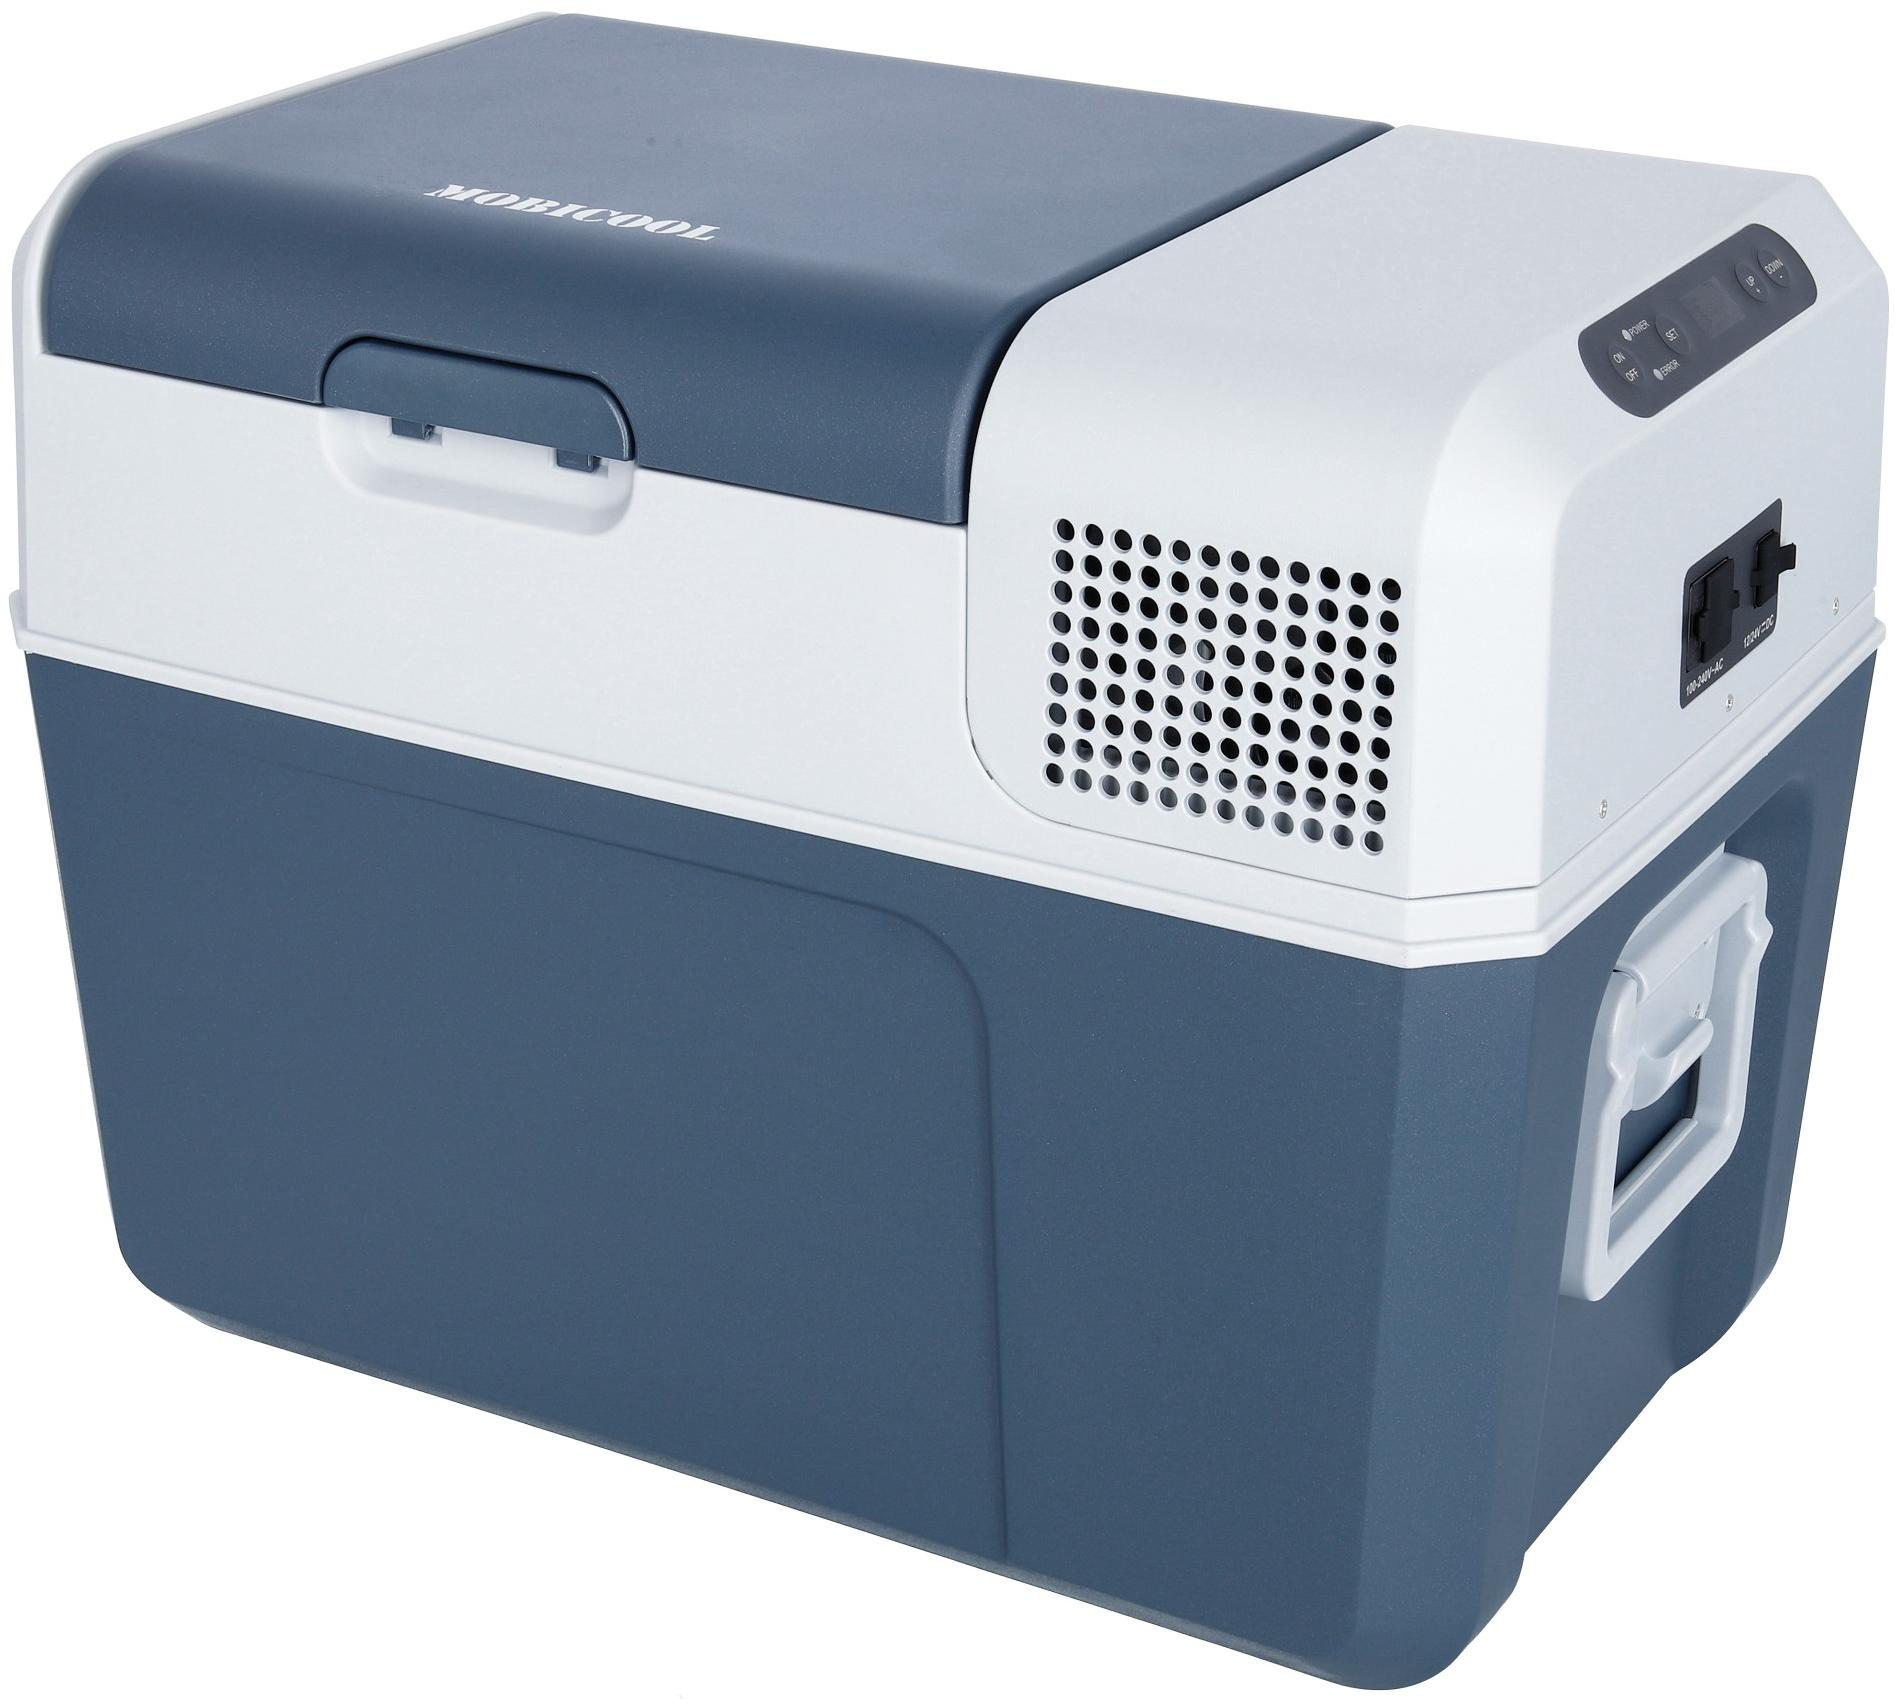 Kompressor-Kühlbox Mobicool FR40 fürs Wohnmobil